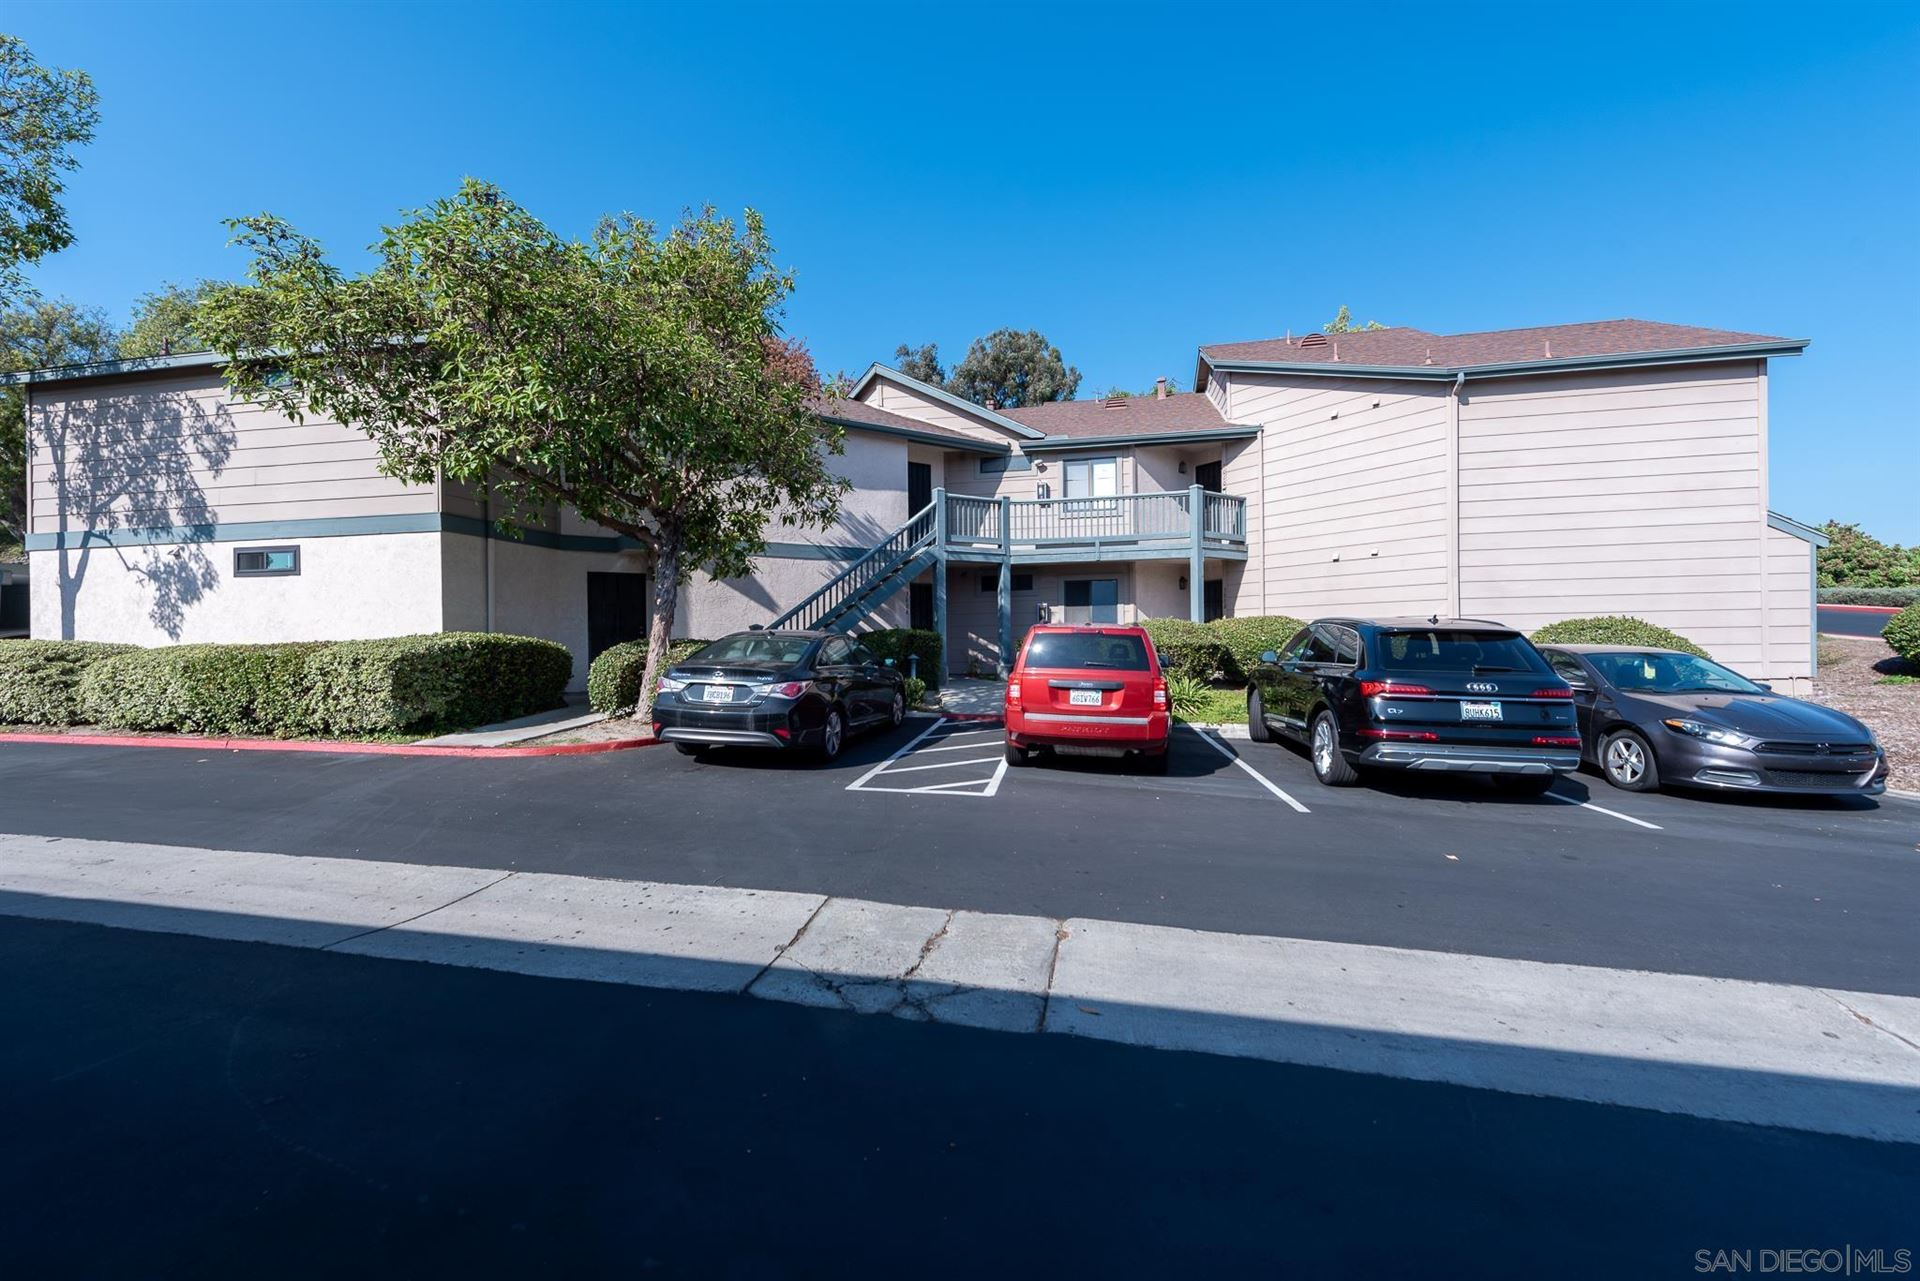 Photo of 3004 Blue Oak Ct, Spring Valley, CA 91978 (MLS # 210026465)